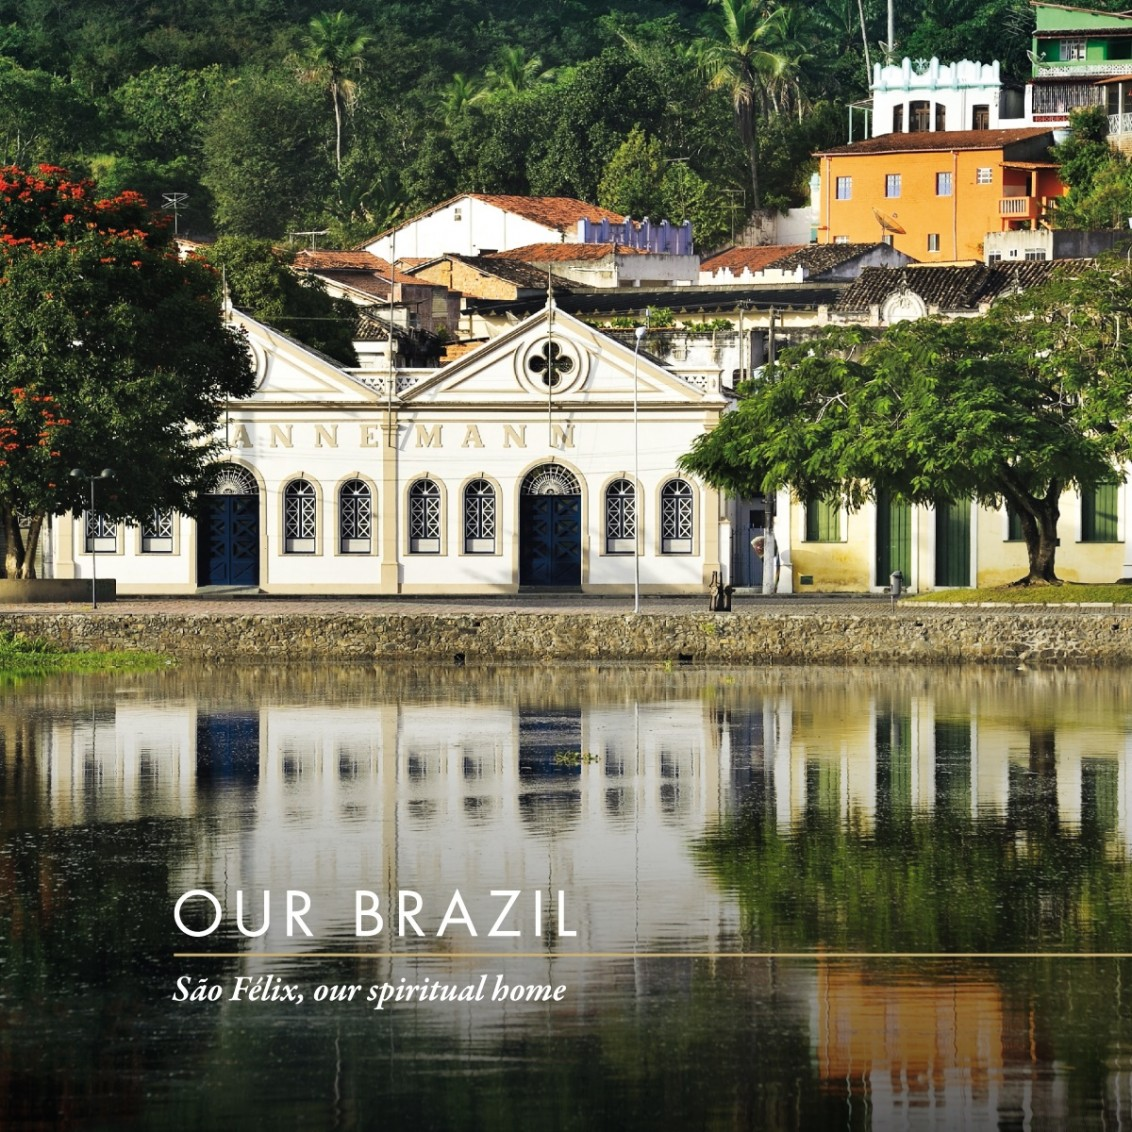 OUR-BRAZIL-ol